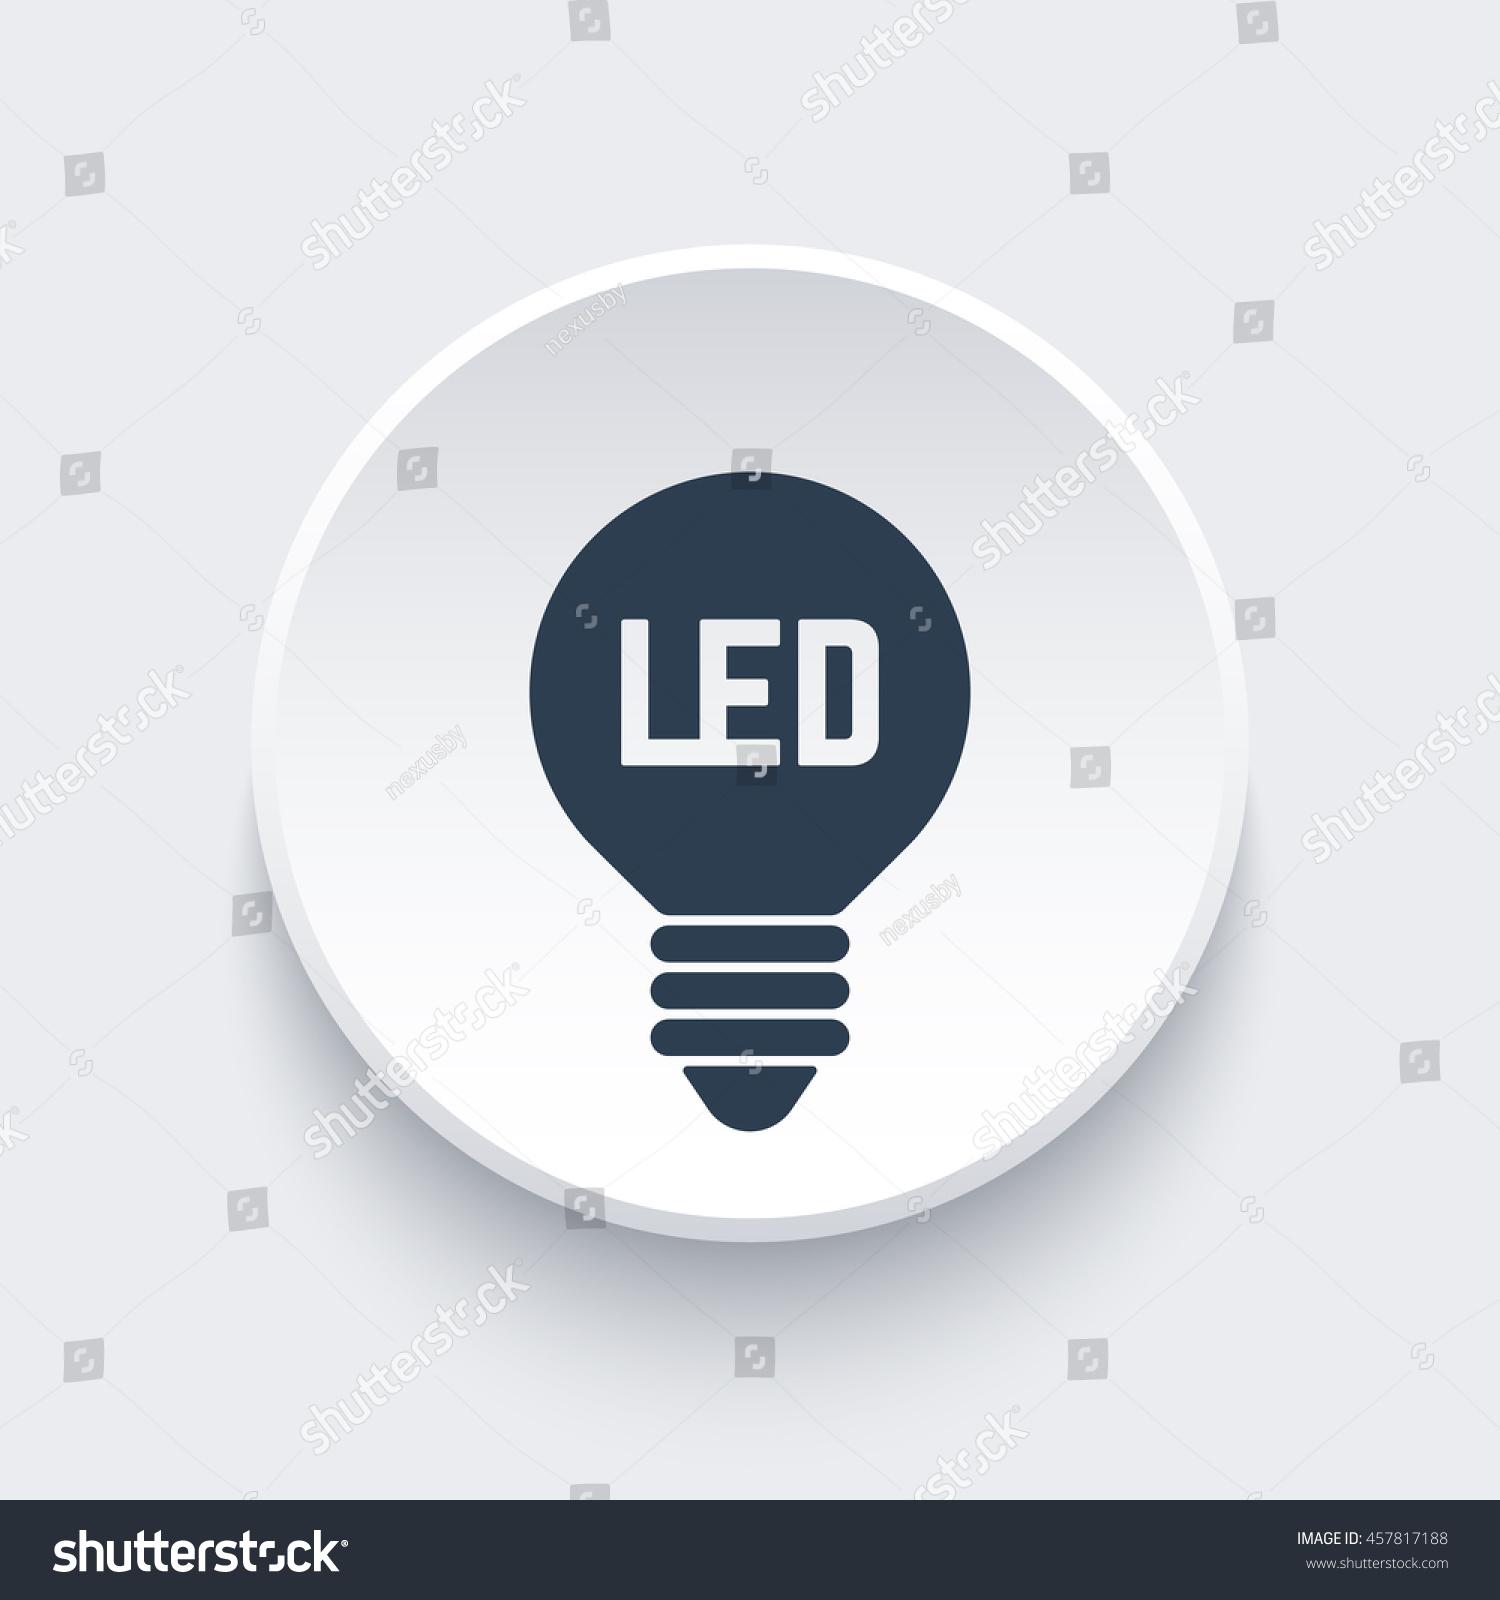 Led Light Bulb Icon On Round Stock Vector 457817188 Shutterstock